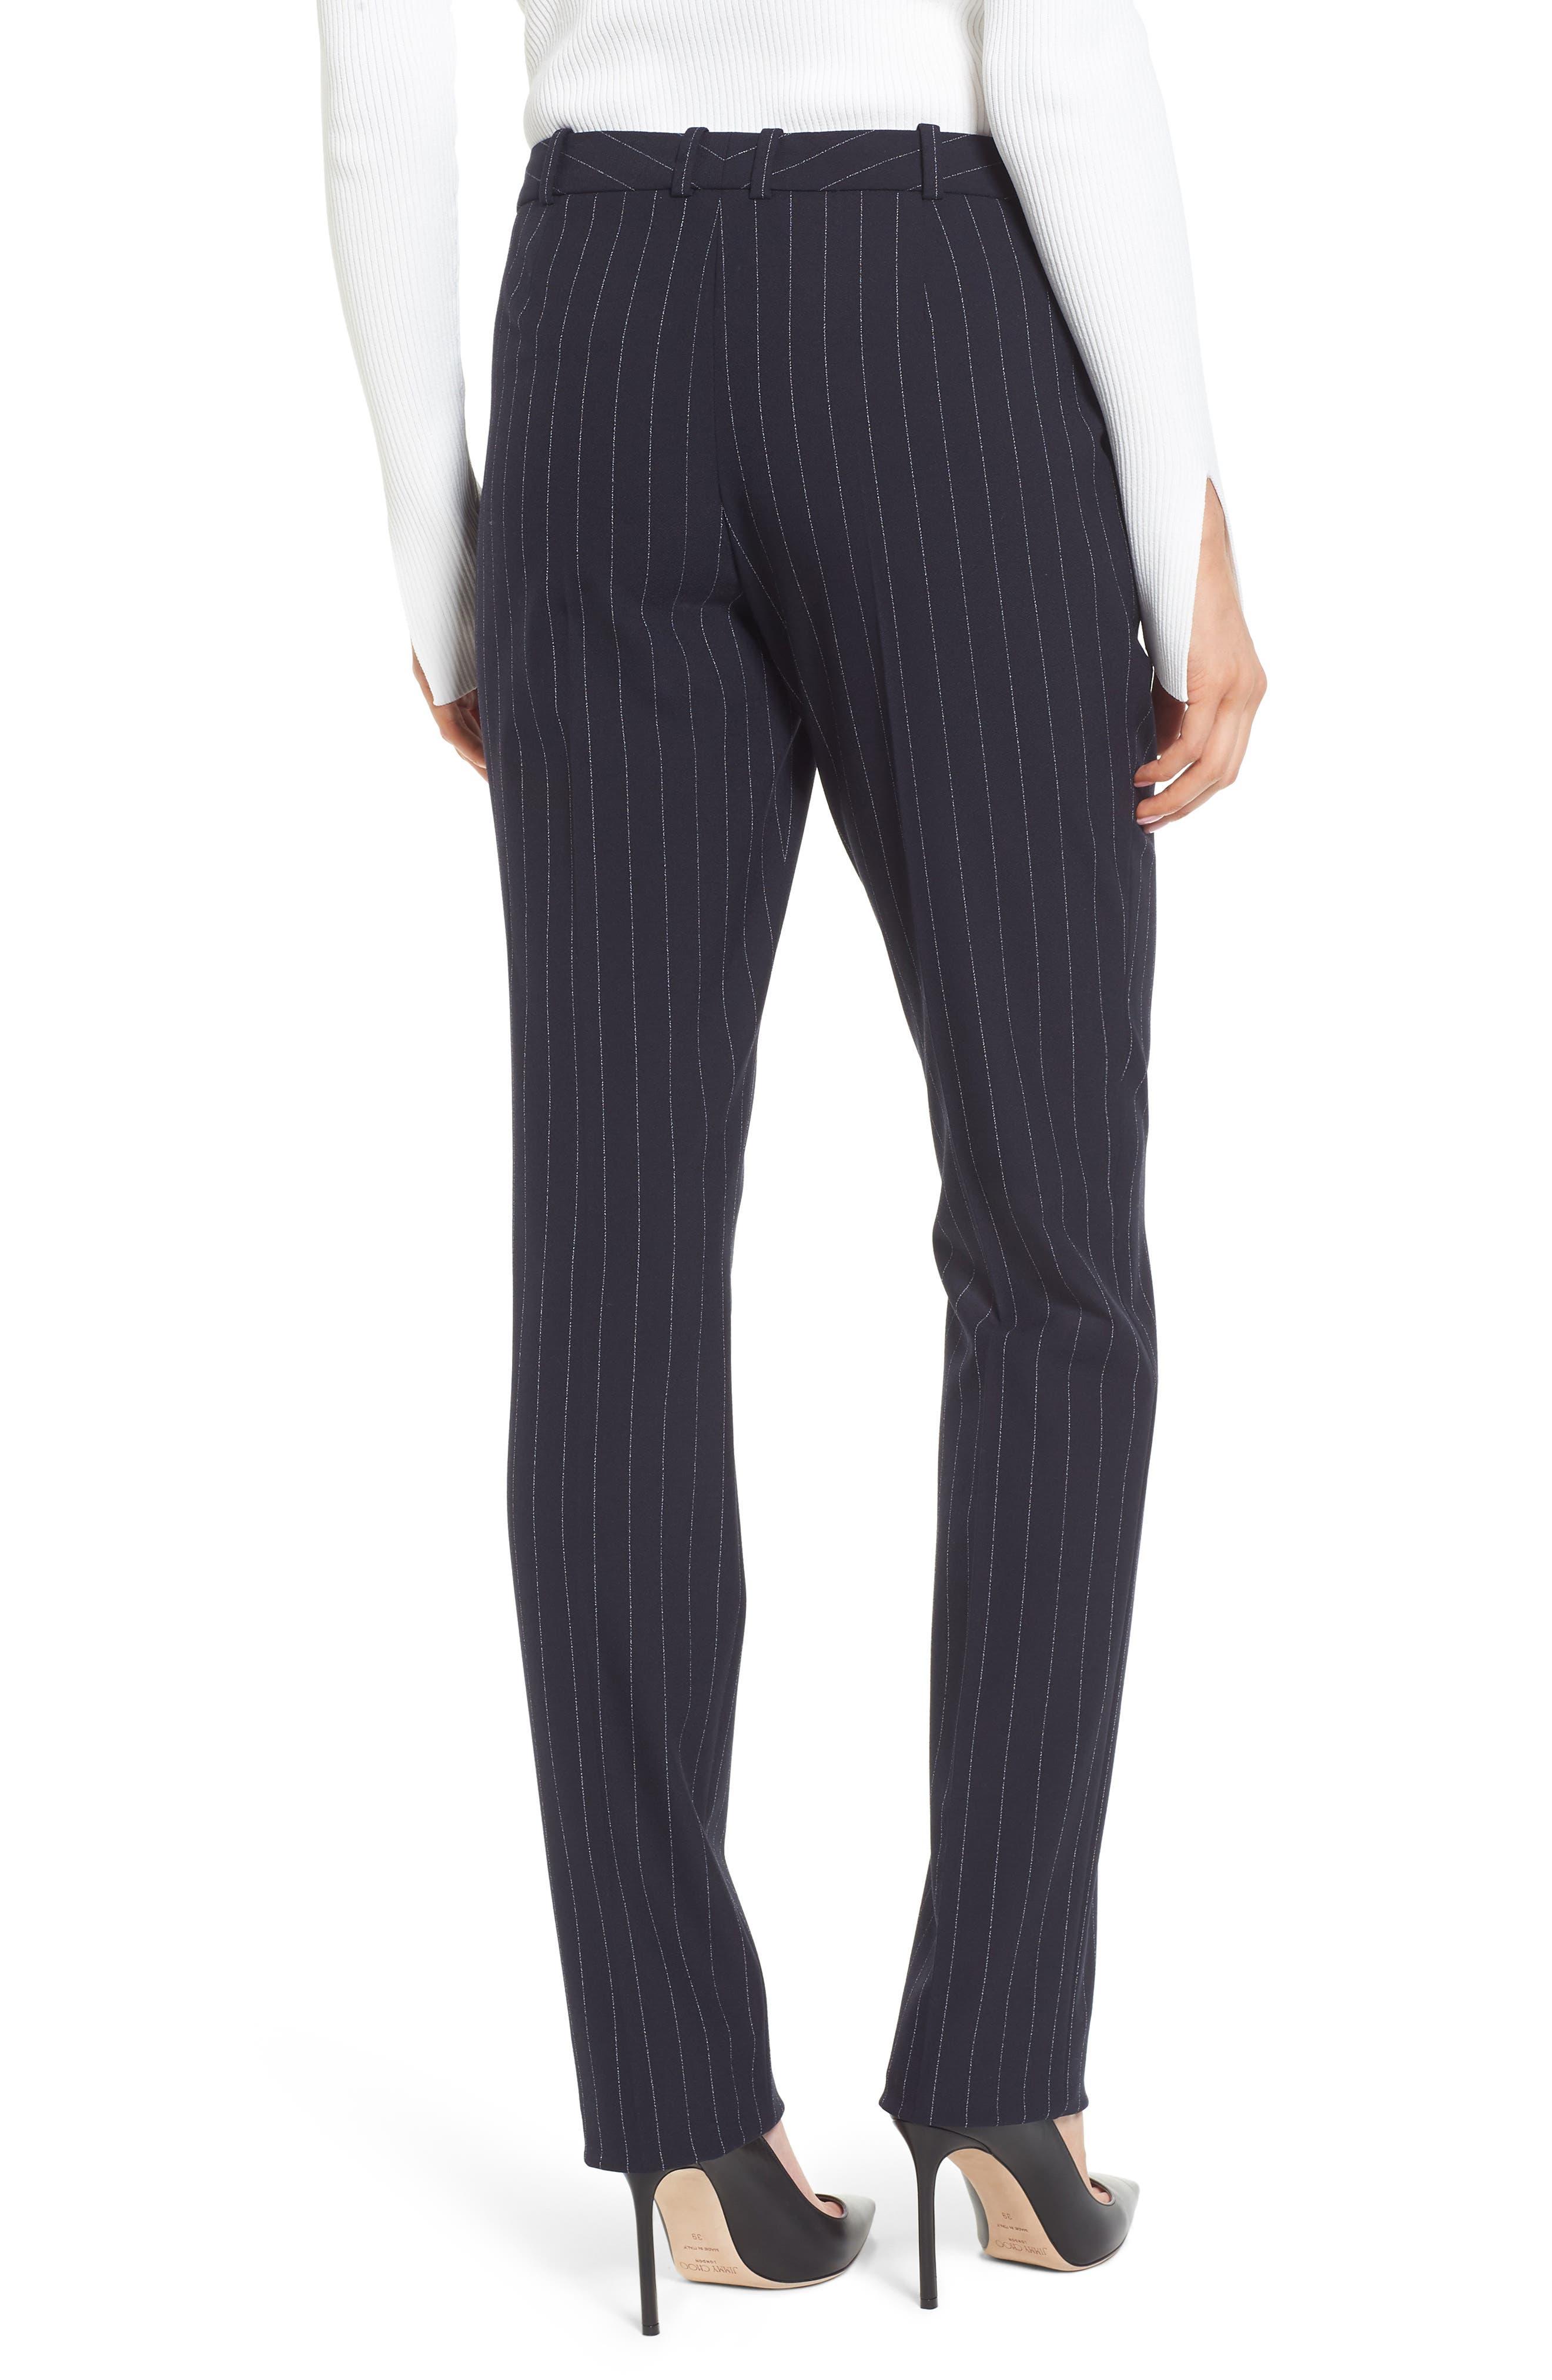 Titana Pinstripe Suit Trousers,                             Alternate thumbnail 2, color,                             461